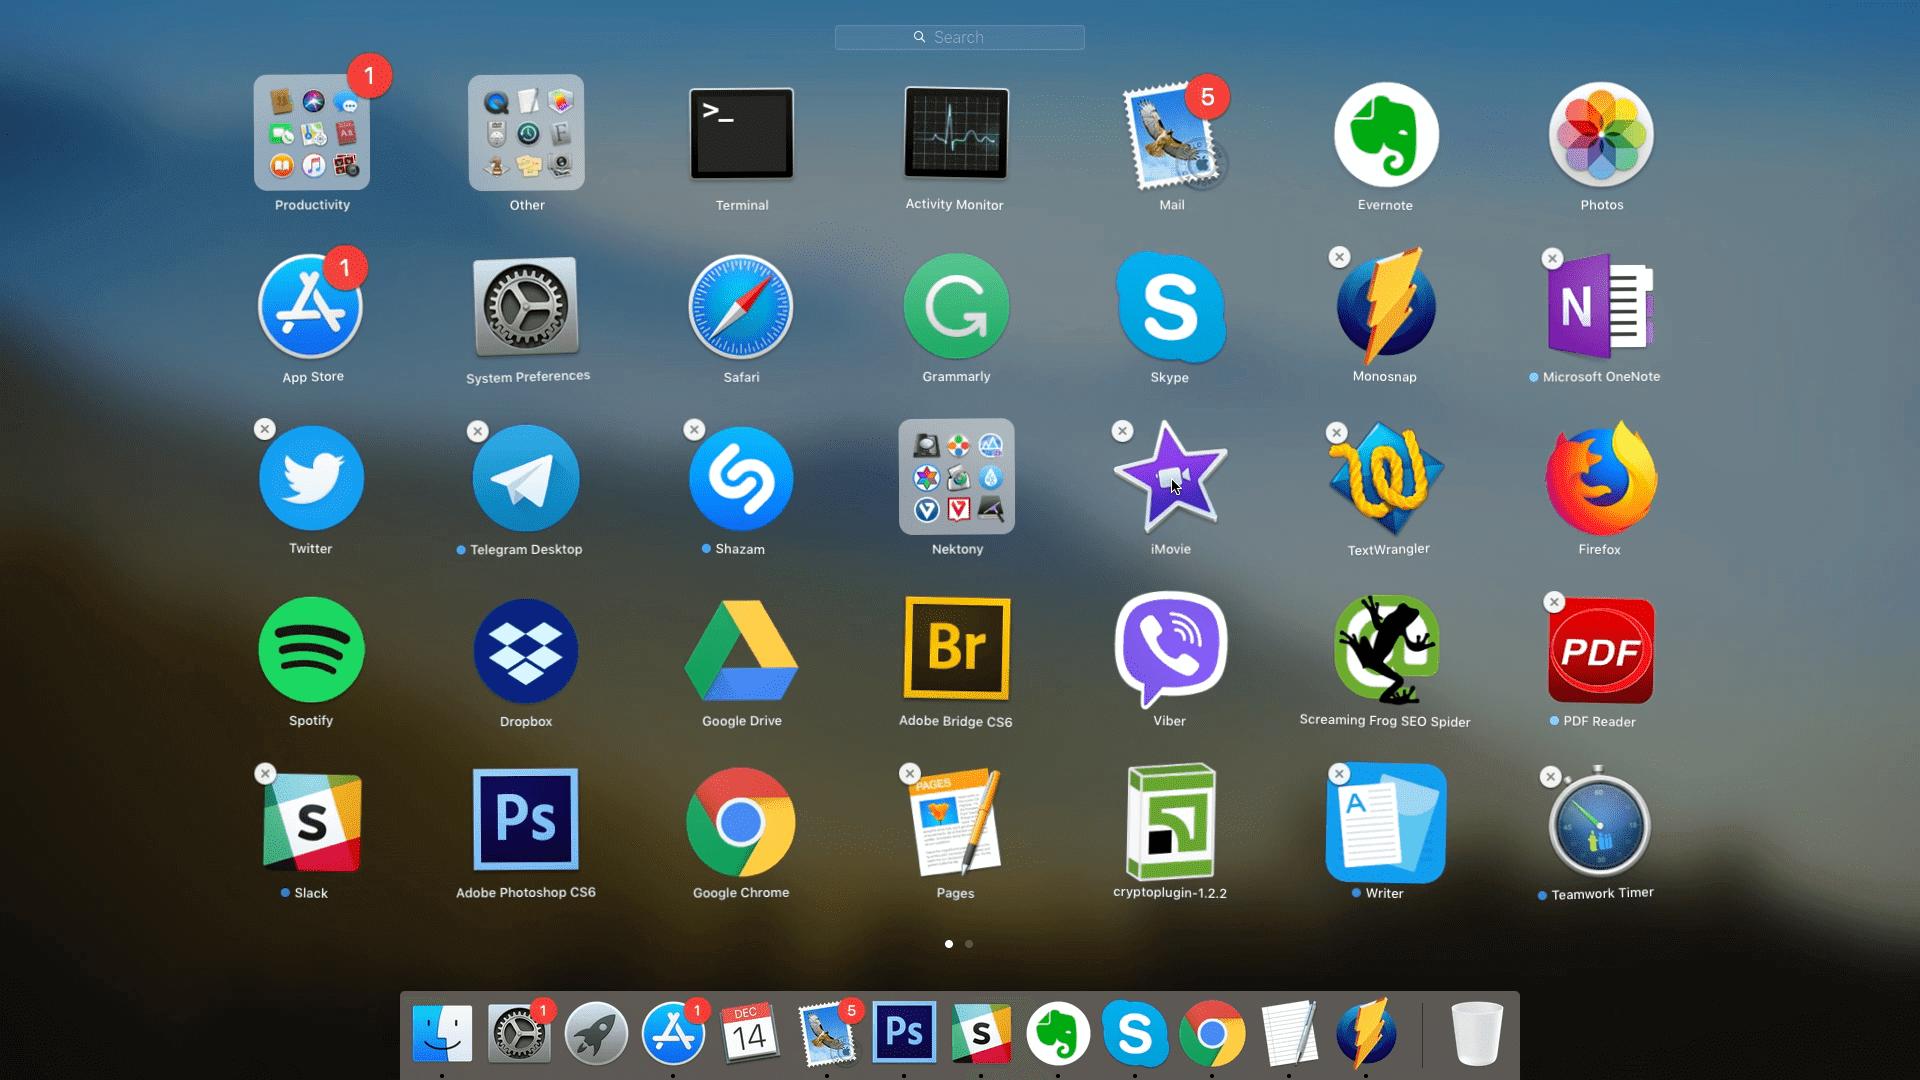 Uninstalling apps on Mac using Launchpad